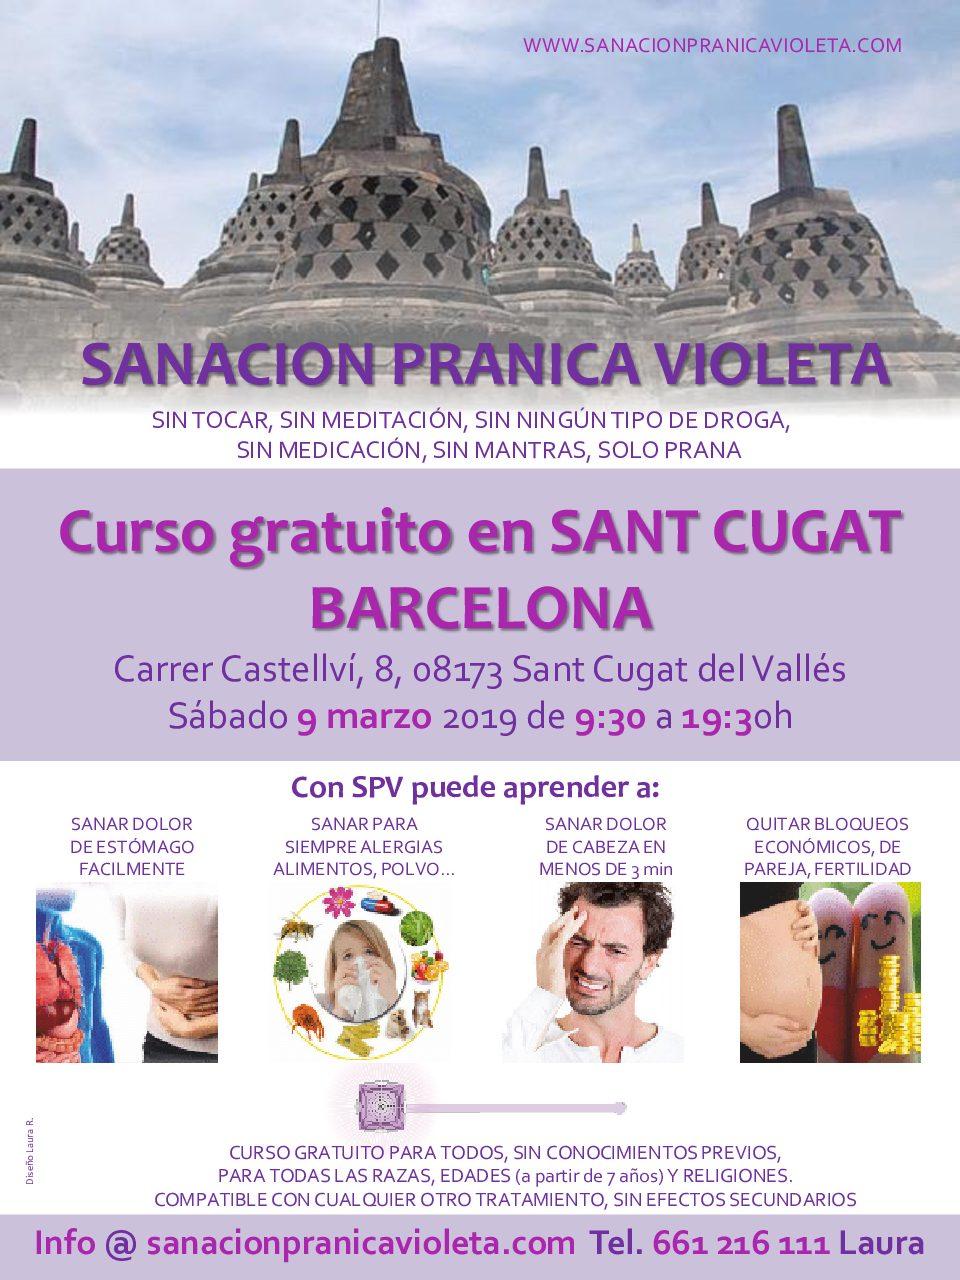 Curso en sant cugat barcelona espa a sanacion pranica - Trade center sant cugat ...